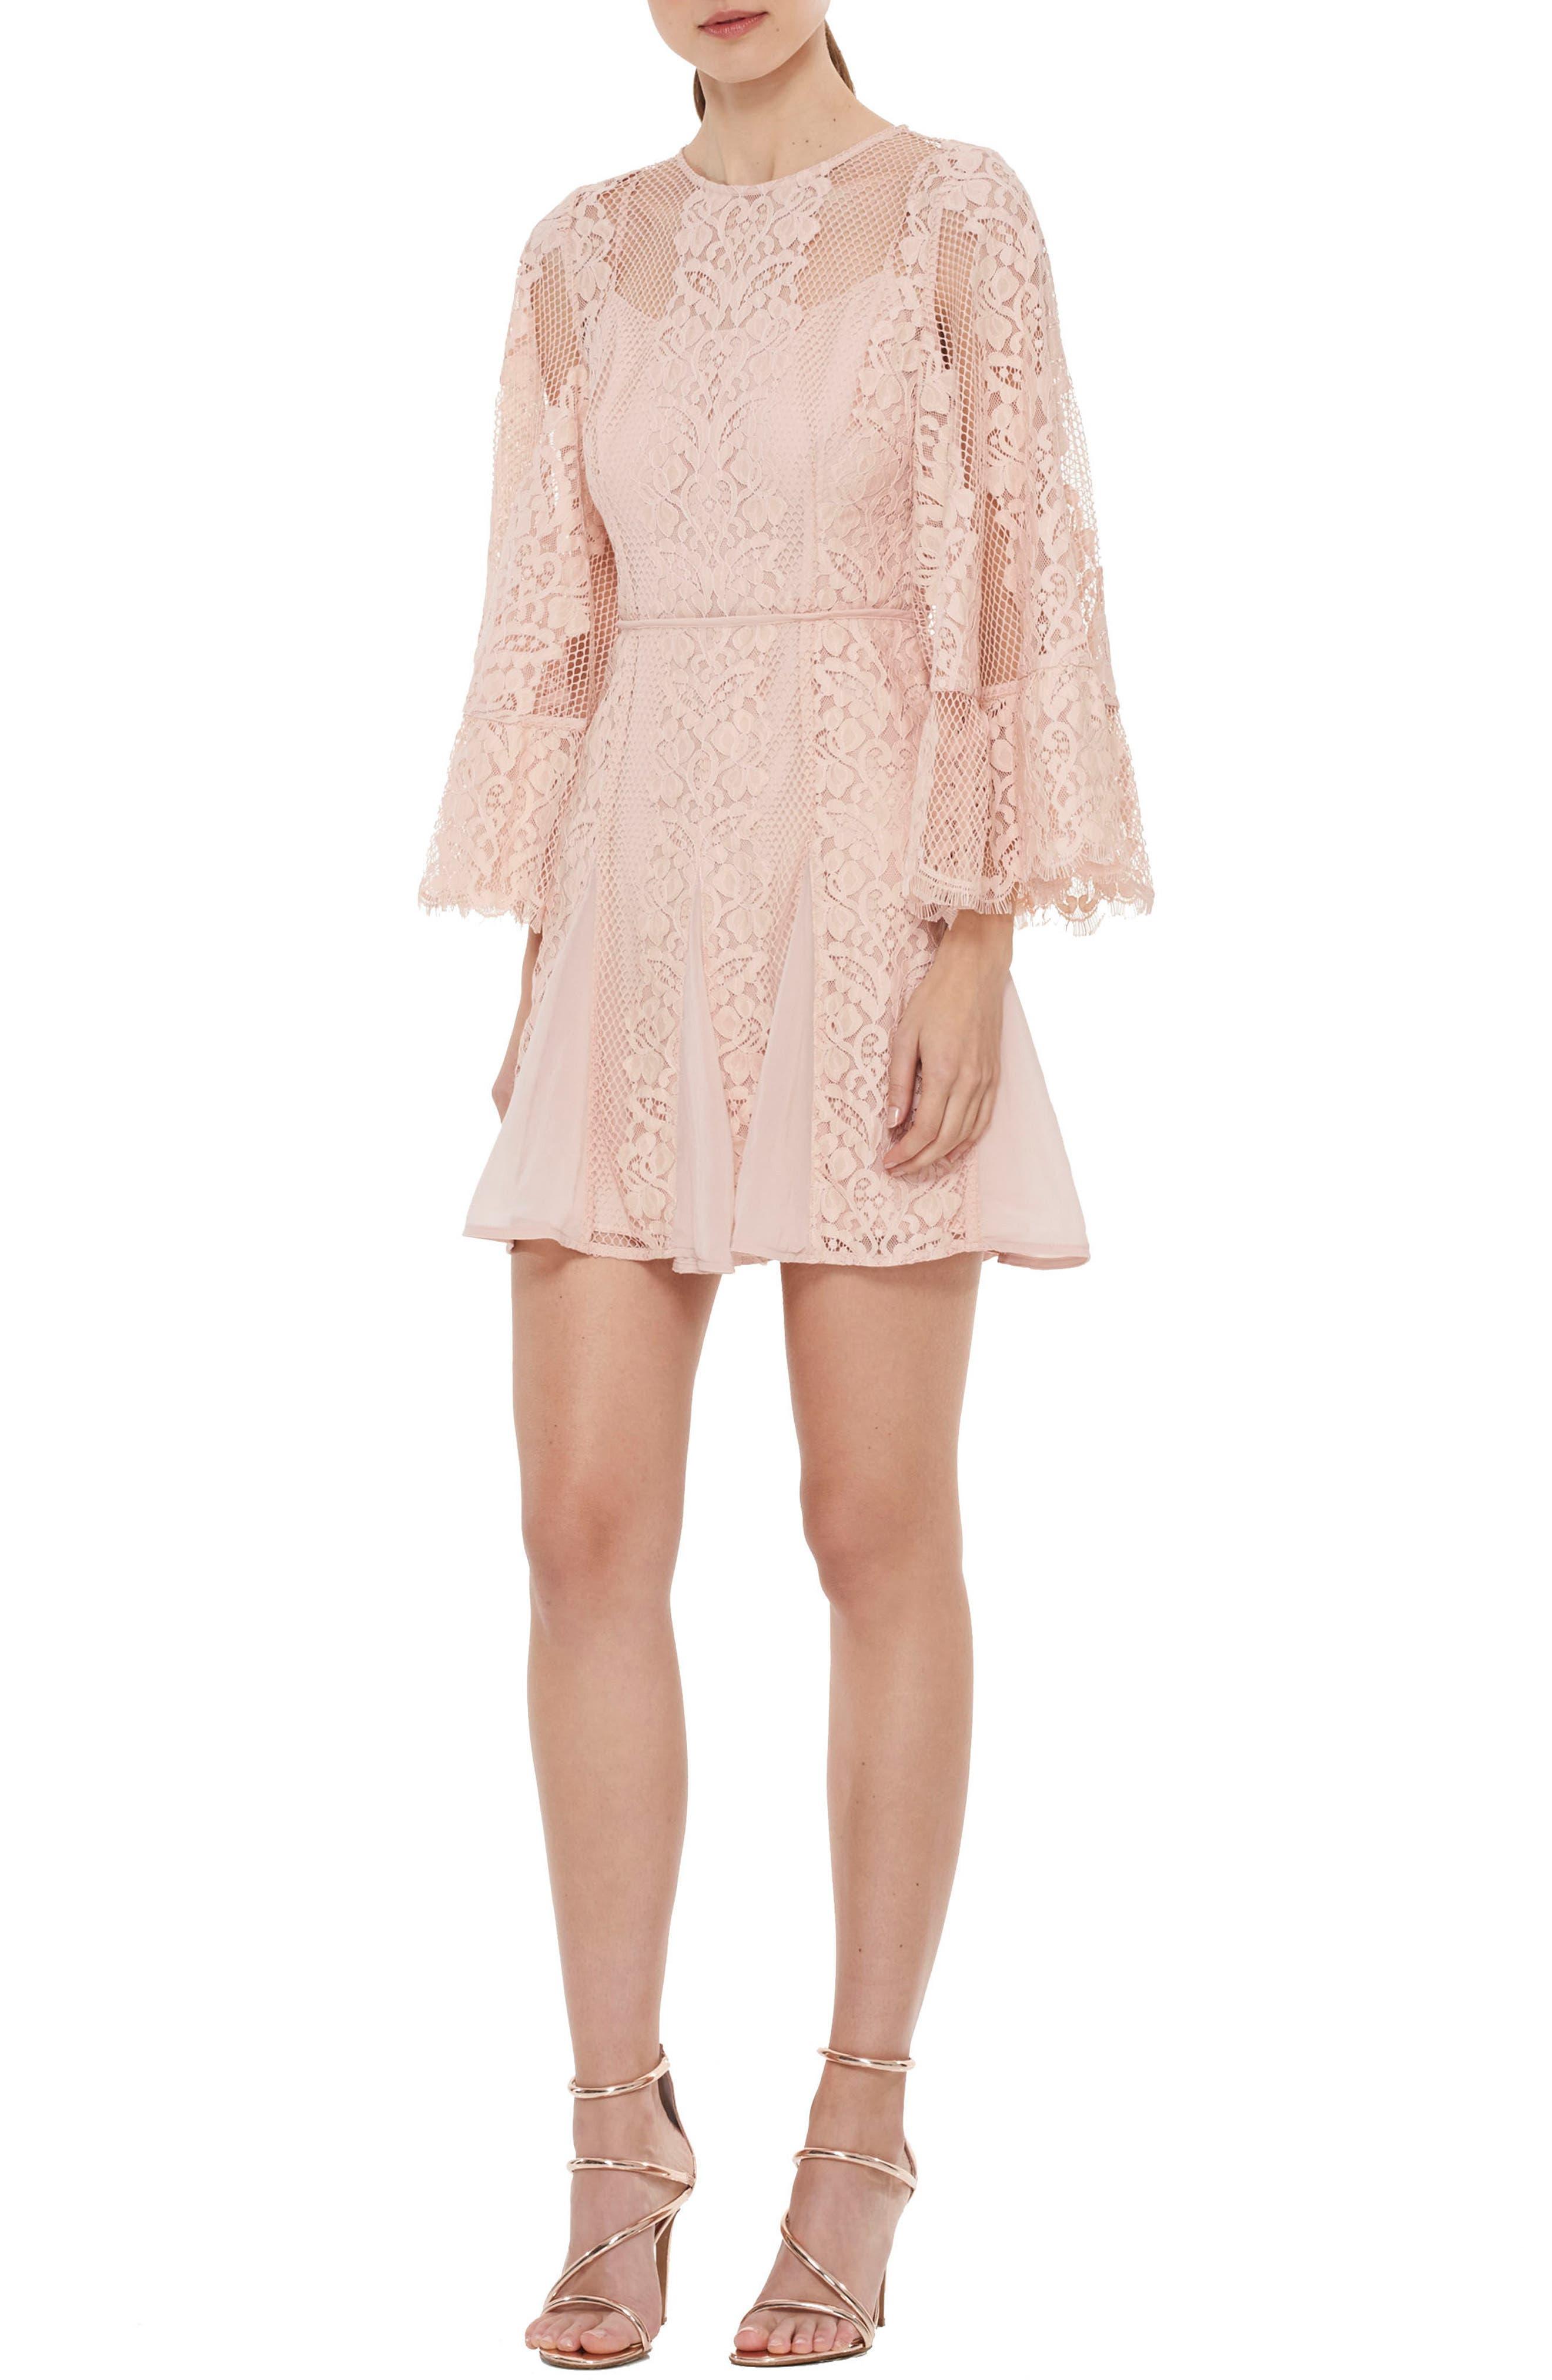 Alternate Image 1 Selected - LA MAISON TALULAH Lust Over Bell Sleeve Lace Dress